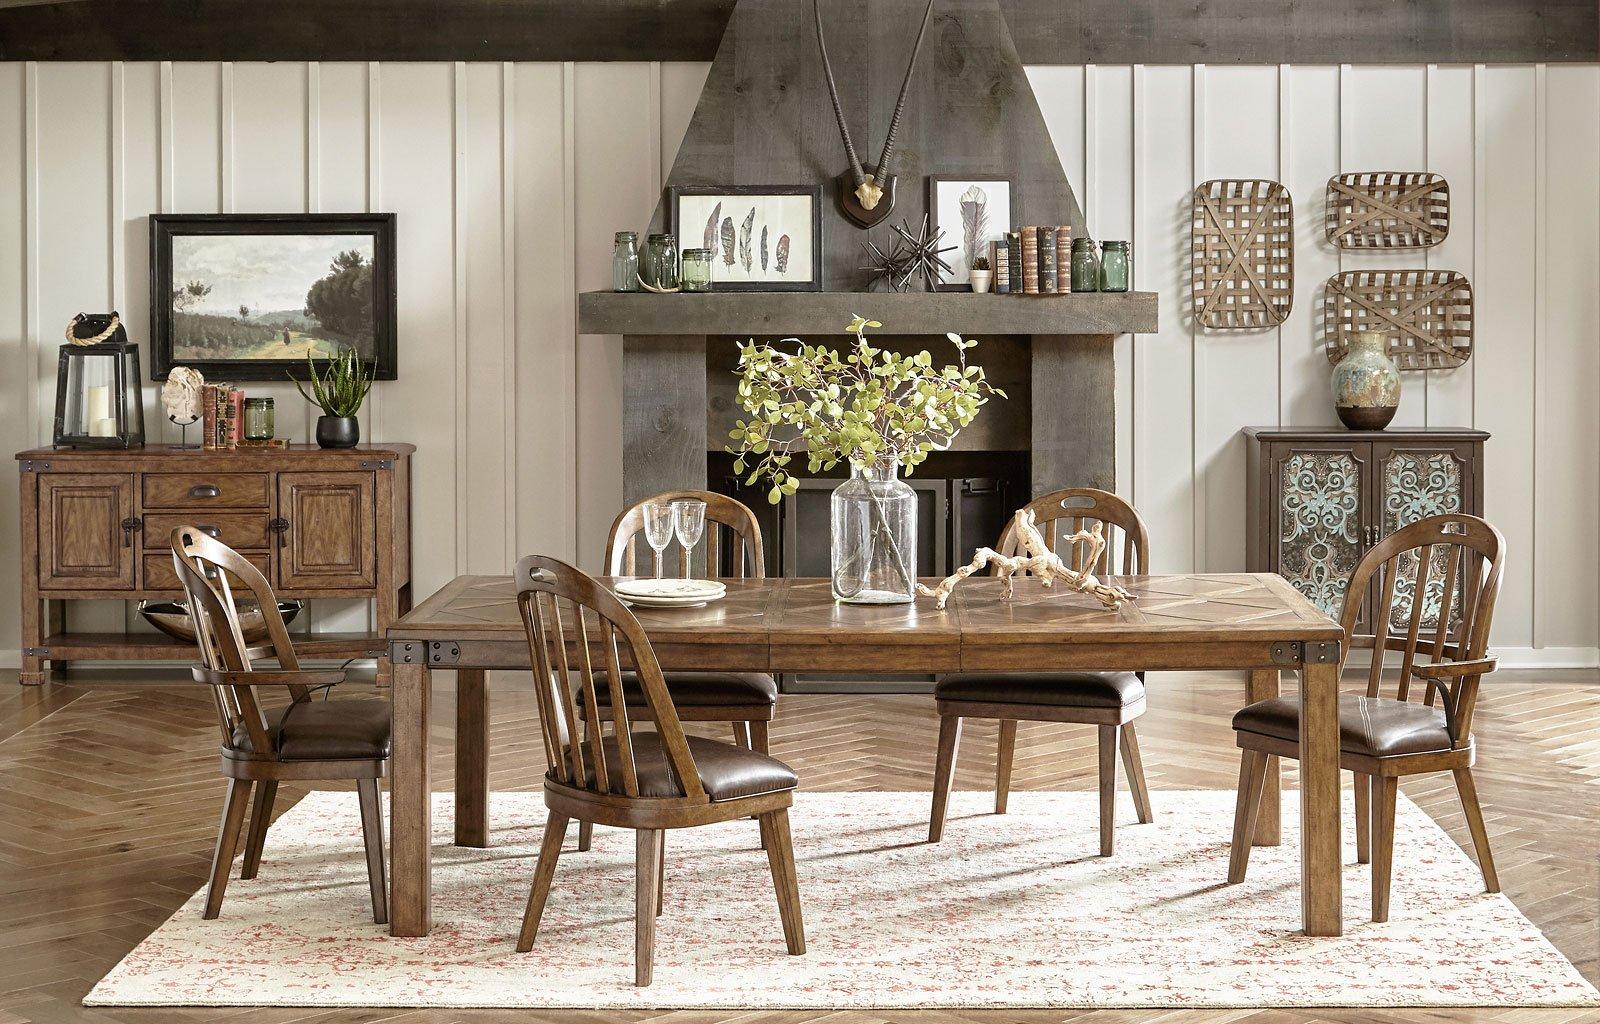 Heartland Falls Dining Room Set w/ Windsor Chairs